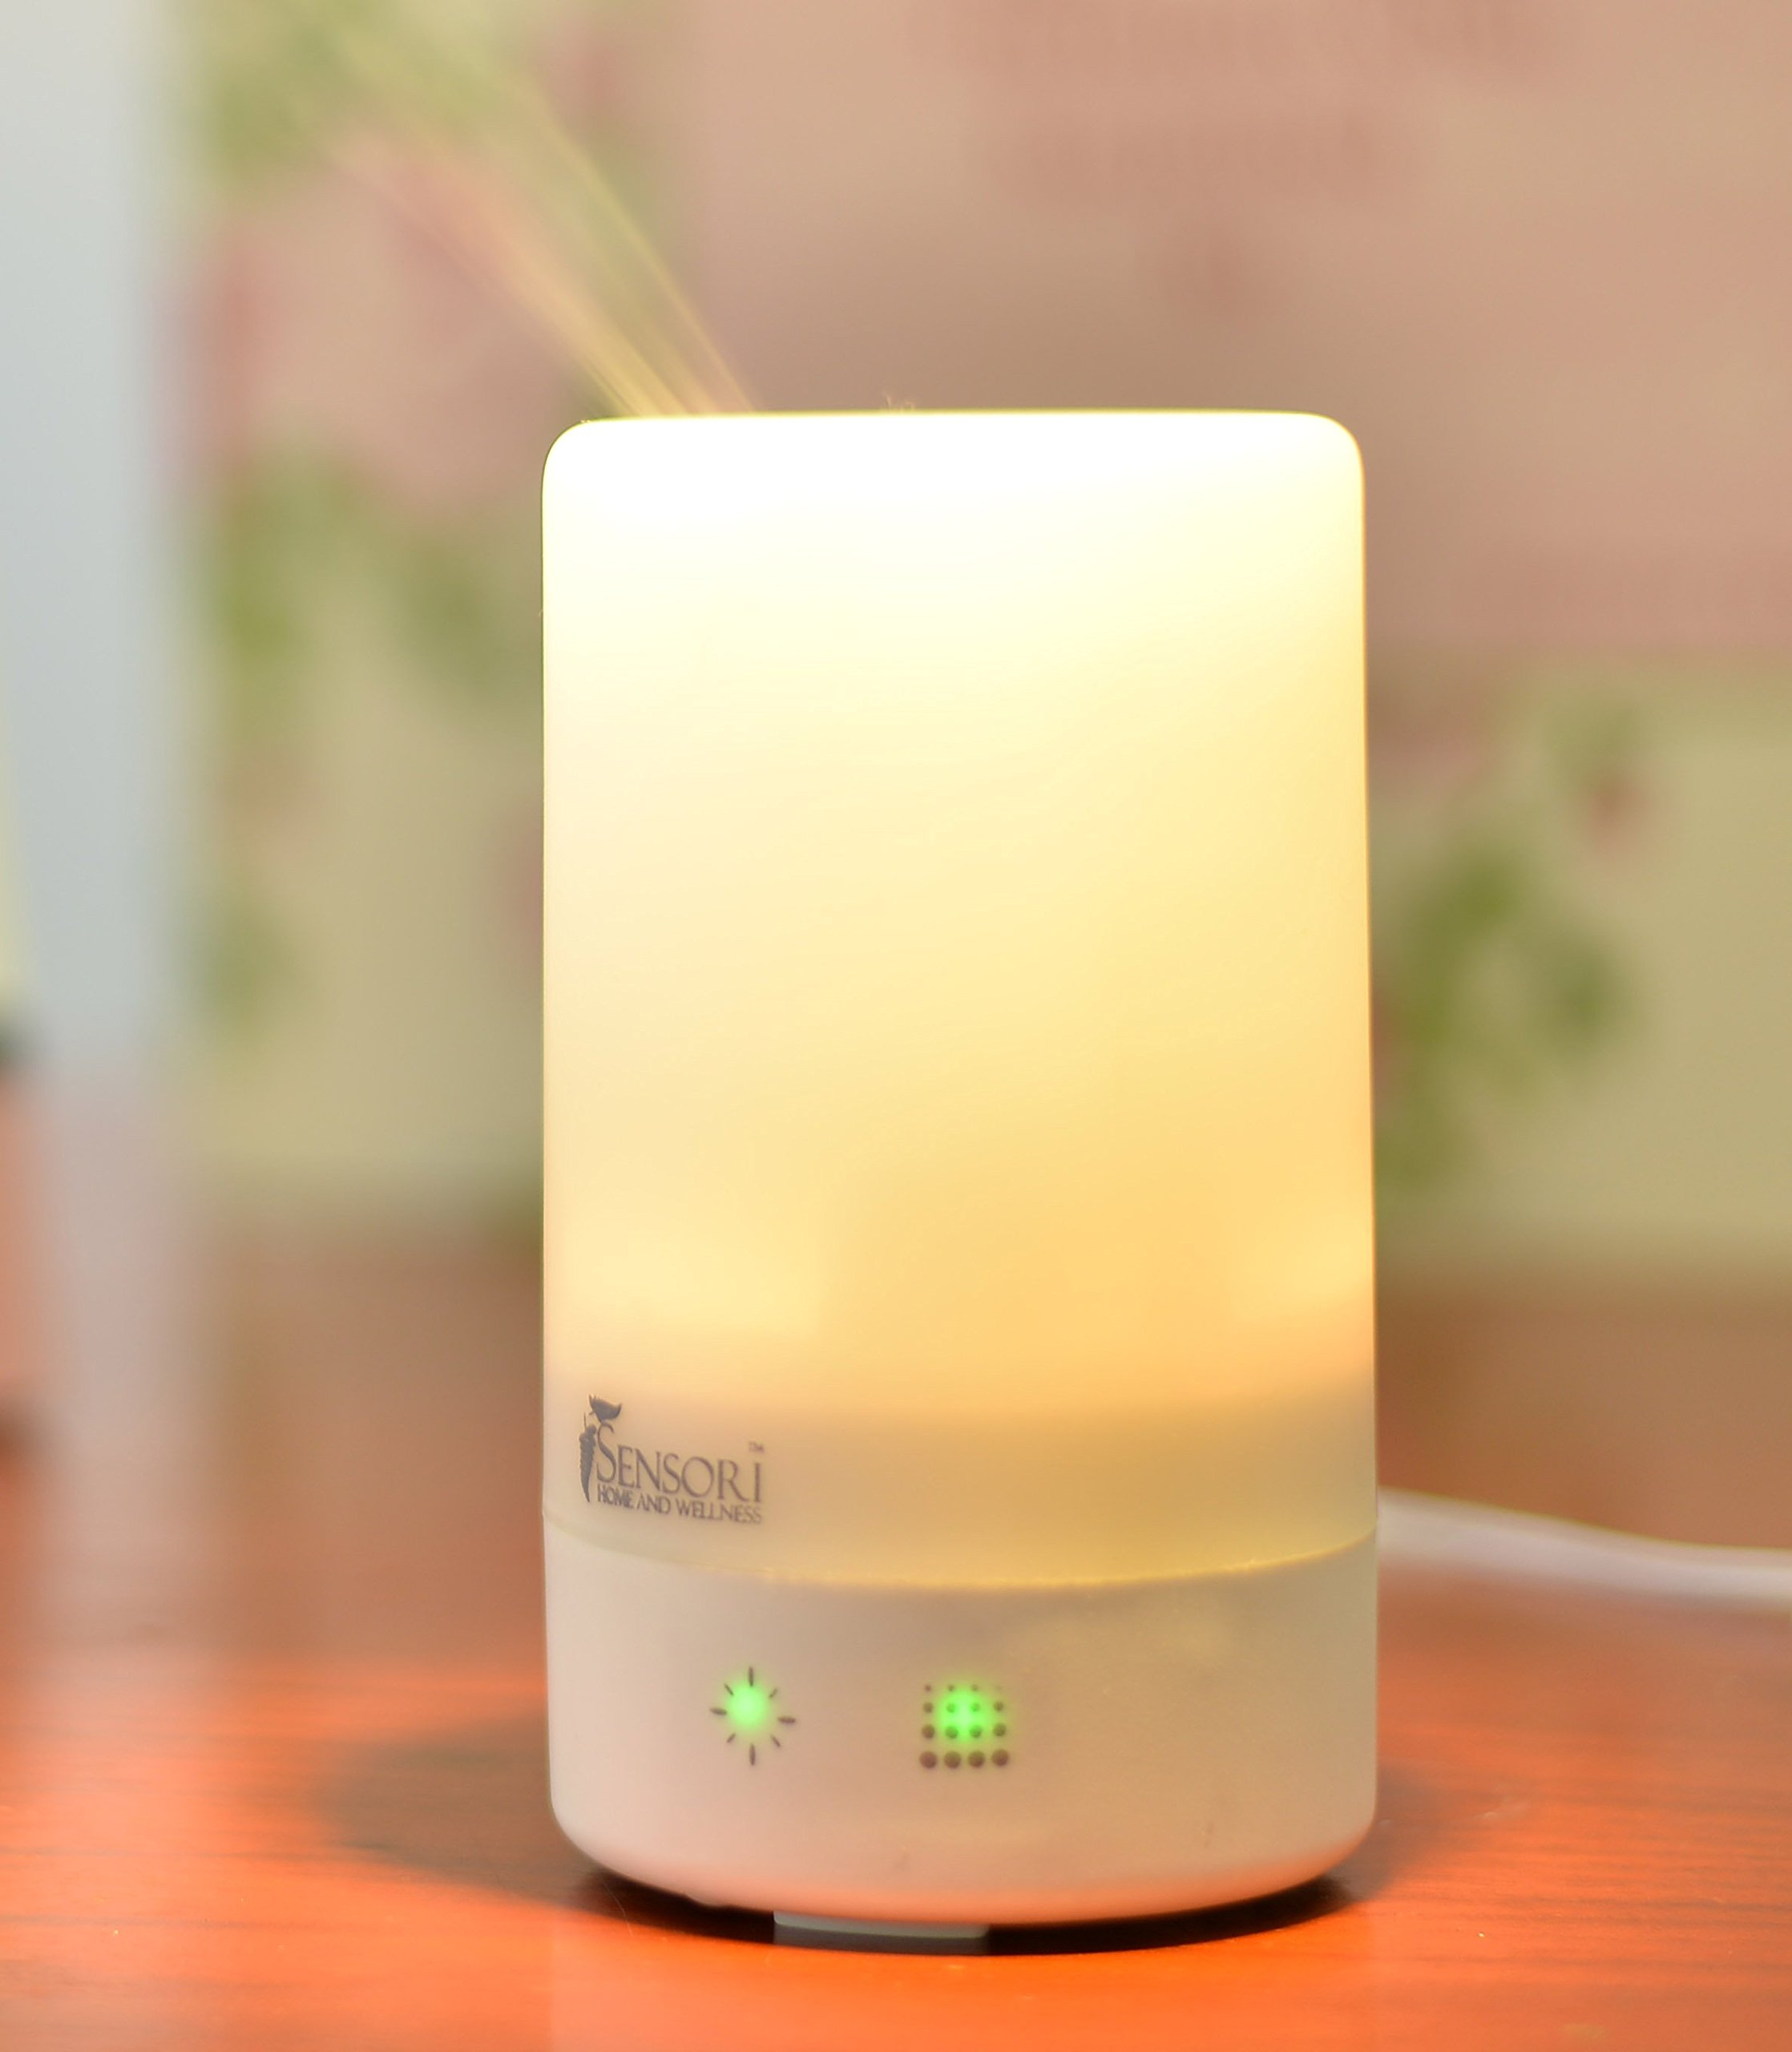 Sensori Aromatherapy Diffuser Humidifier